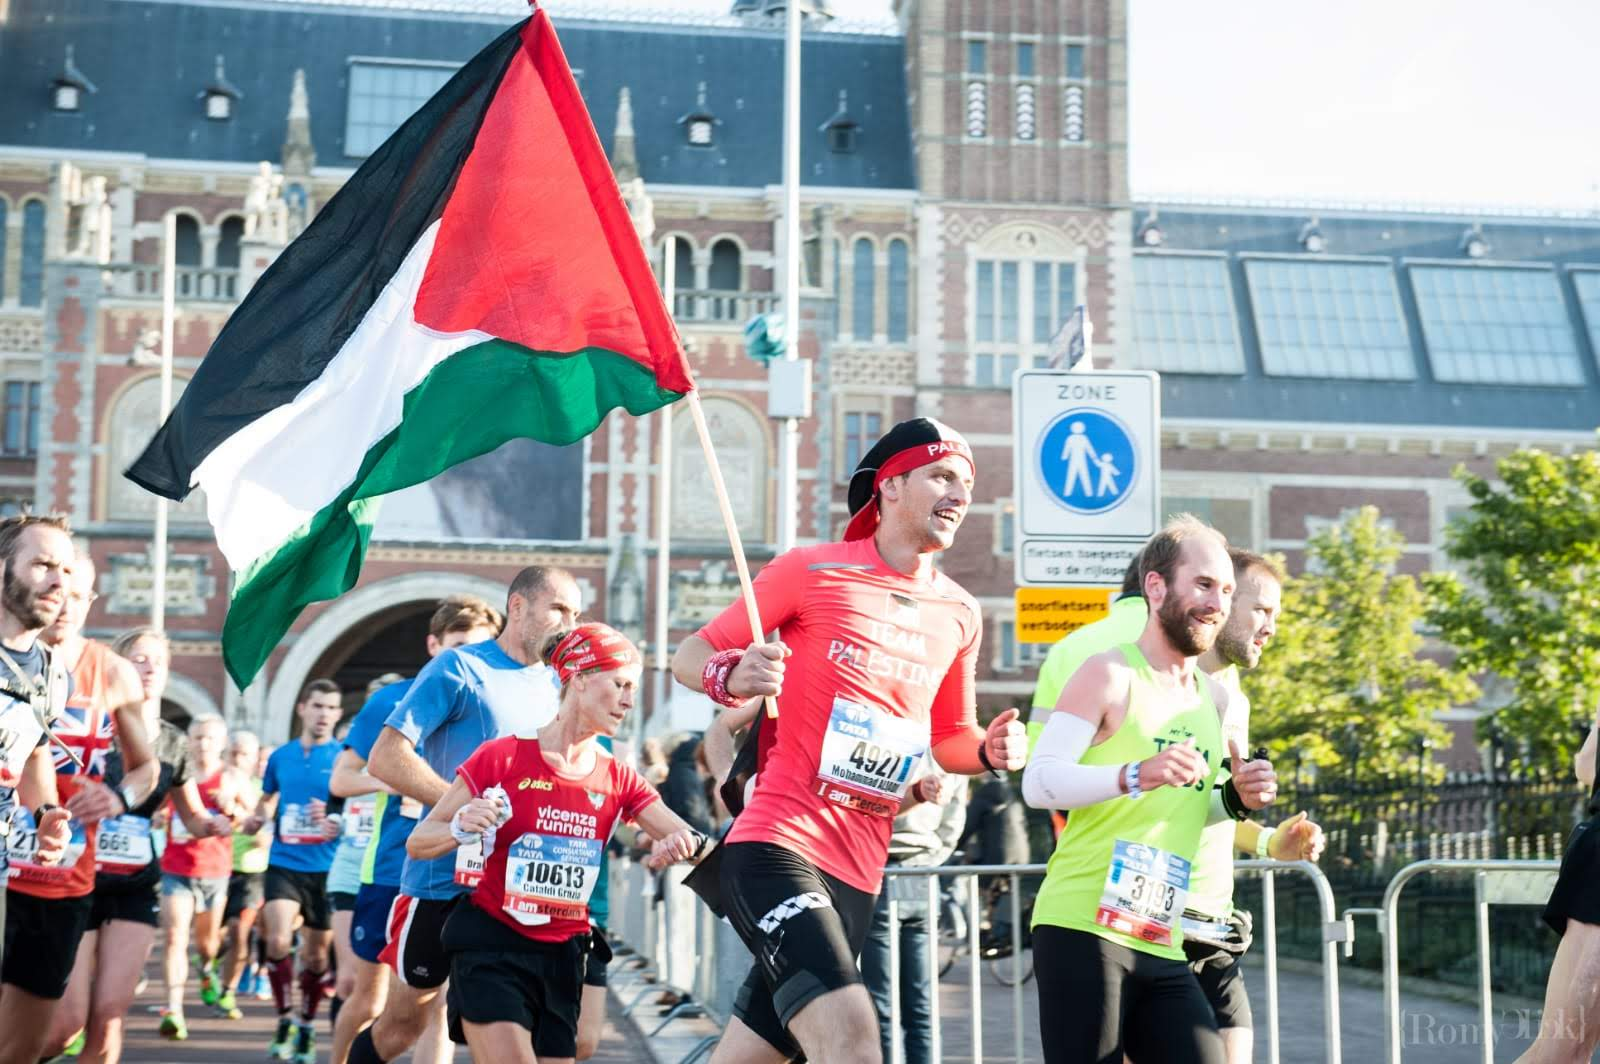 20-okt.-amsterdam:-running-for-palestine:-mohammad´s-20e-marathon-–-docp